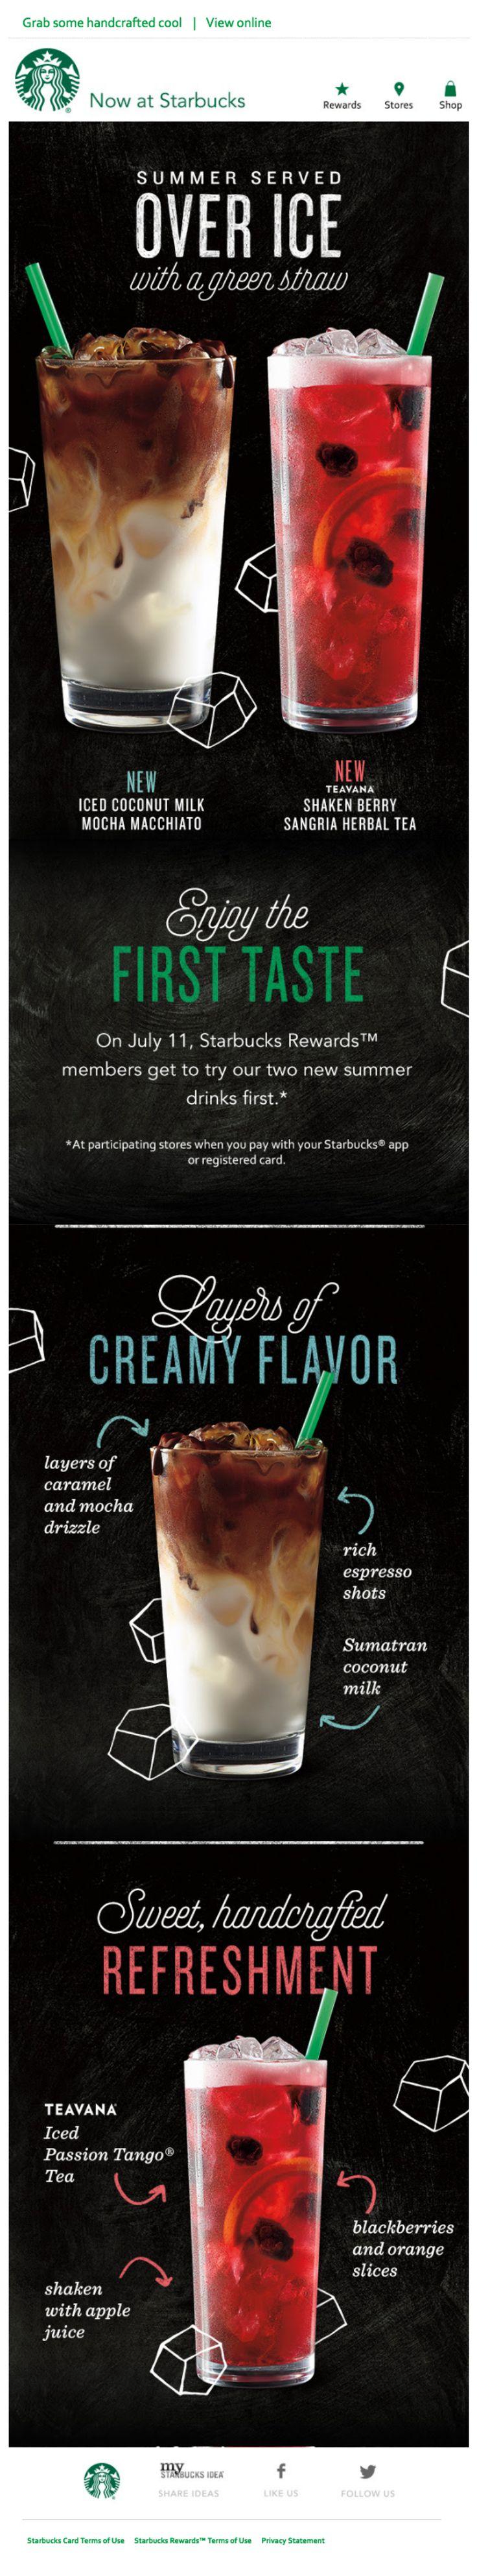 Starbucks - Email Marketing, First taste